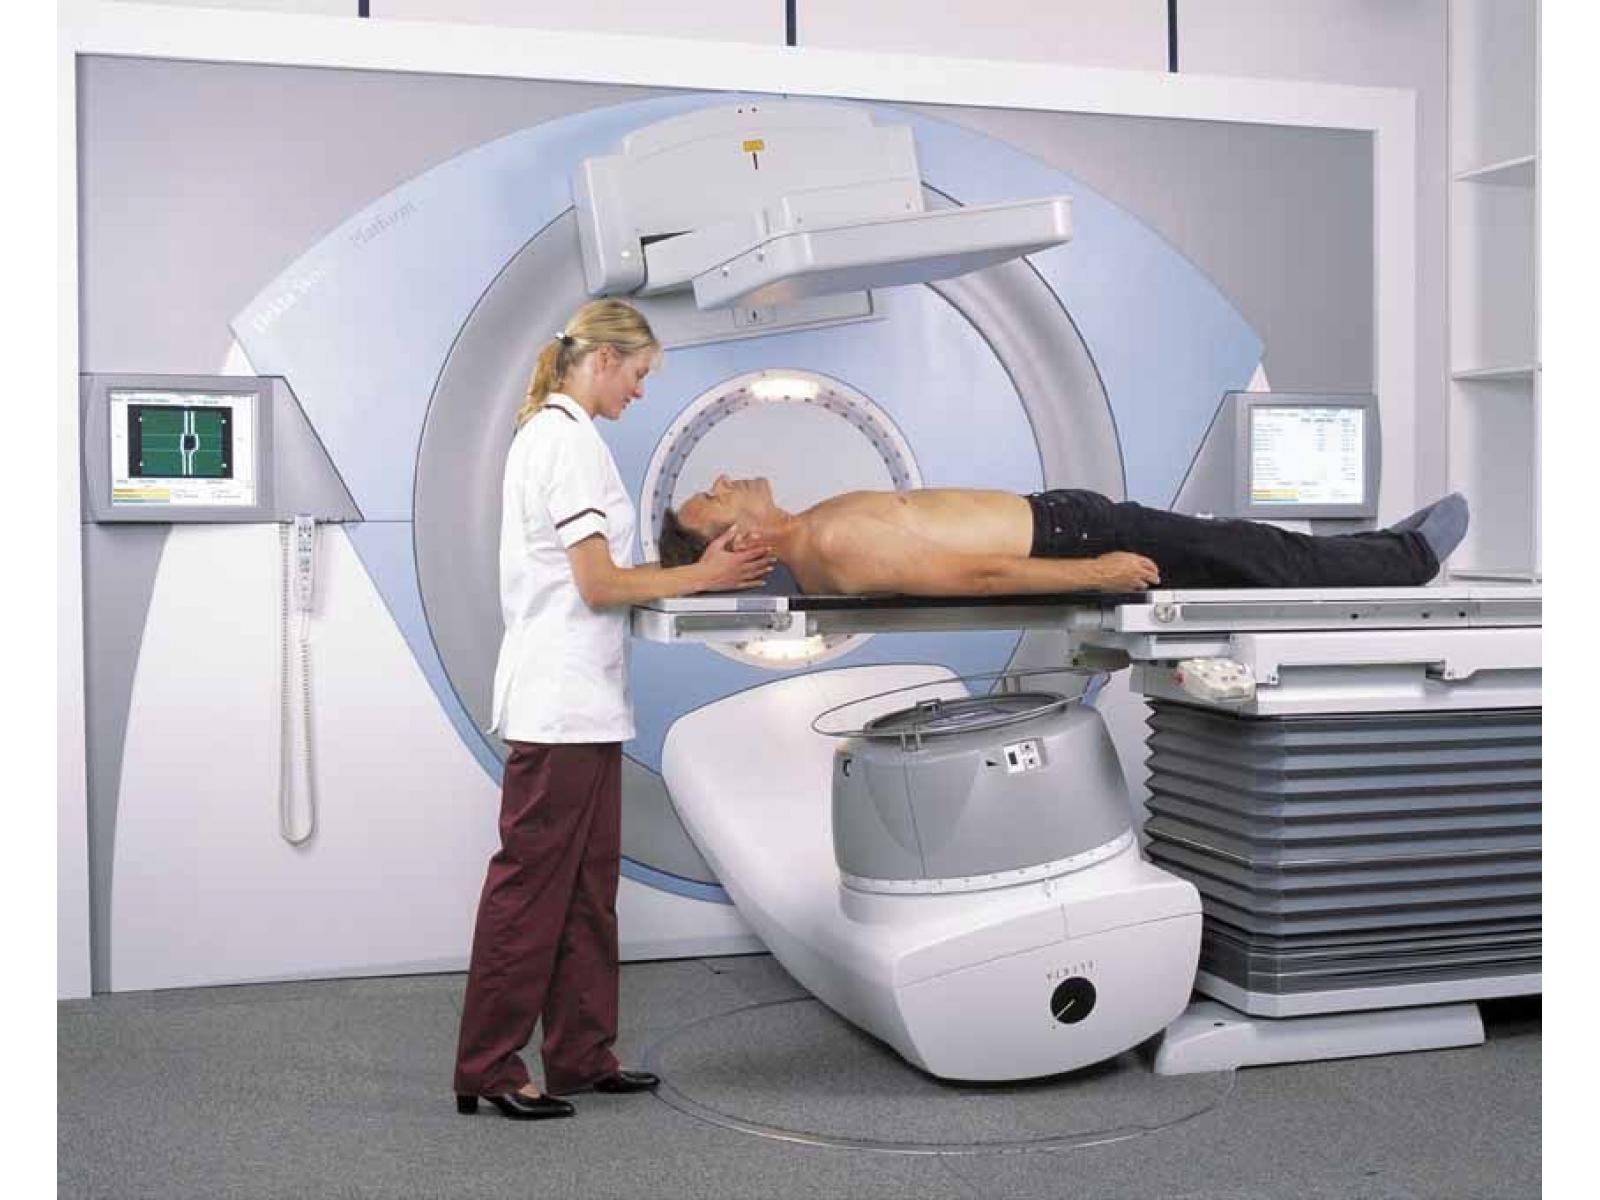 Spitalul OncoFort - 5radioterapie.jpg